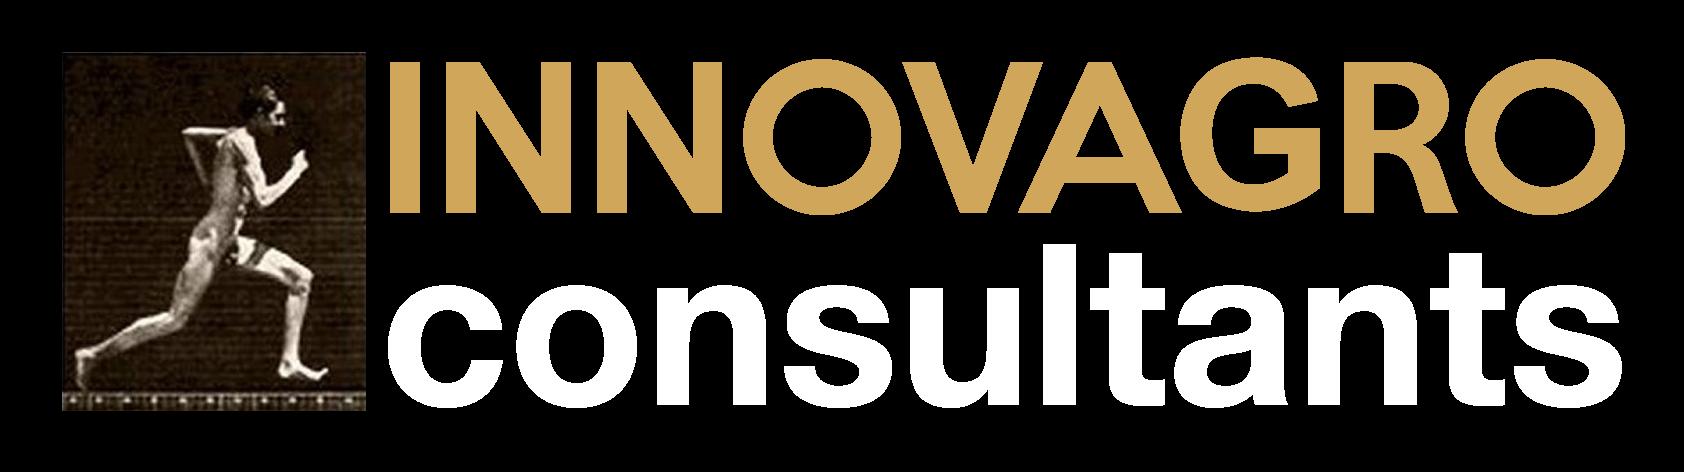 Innovagro consultants